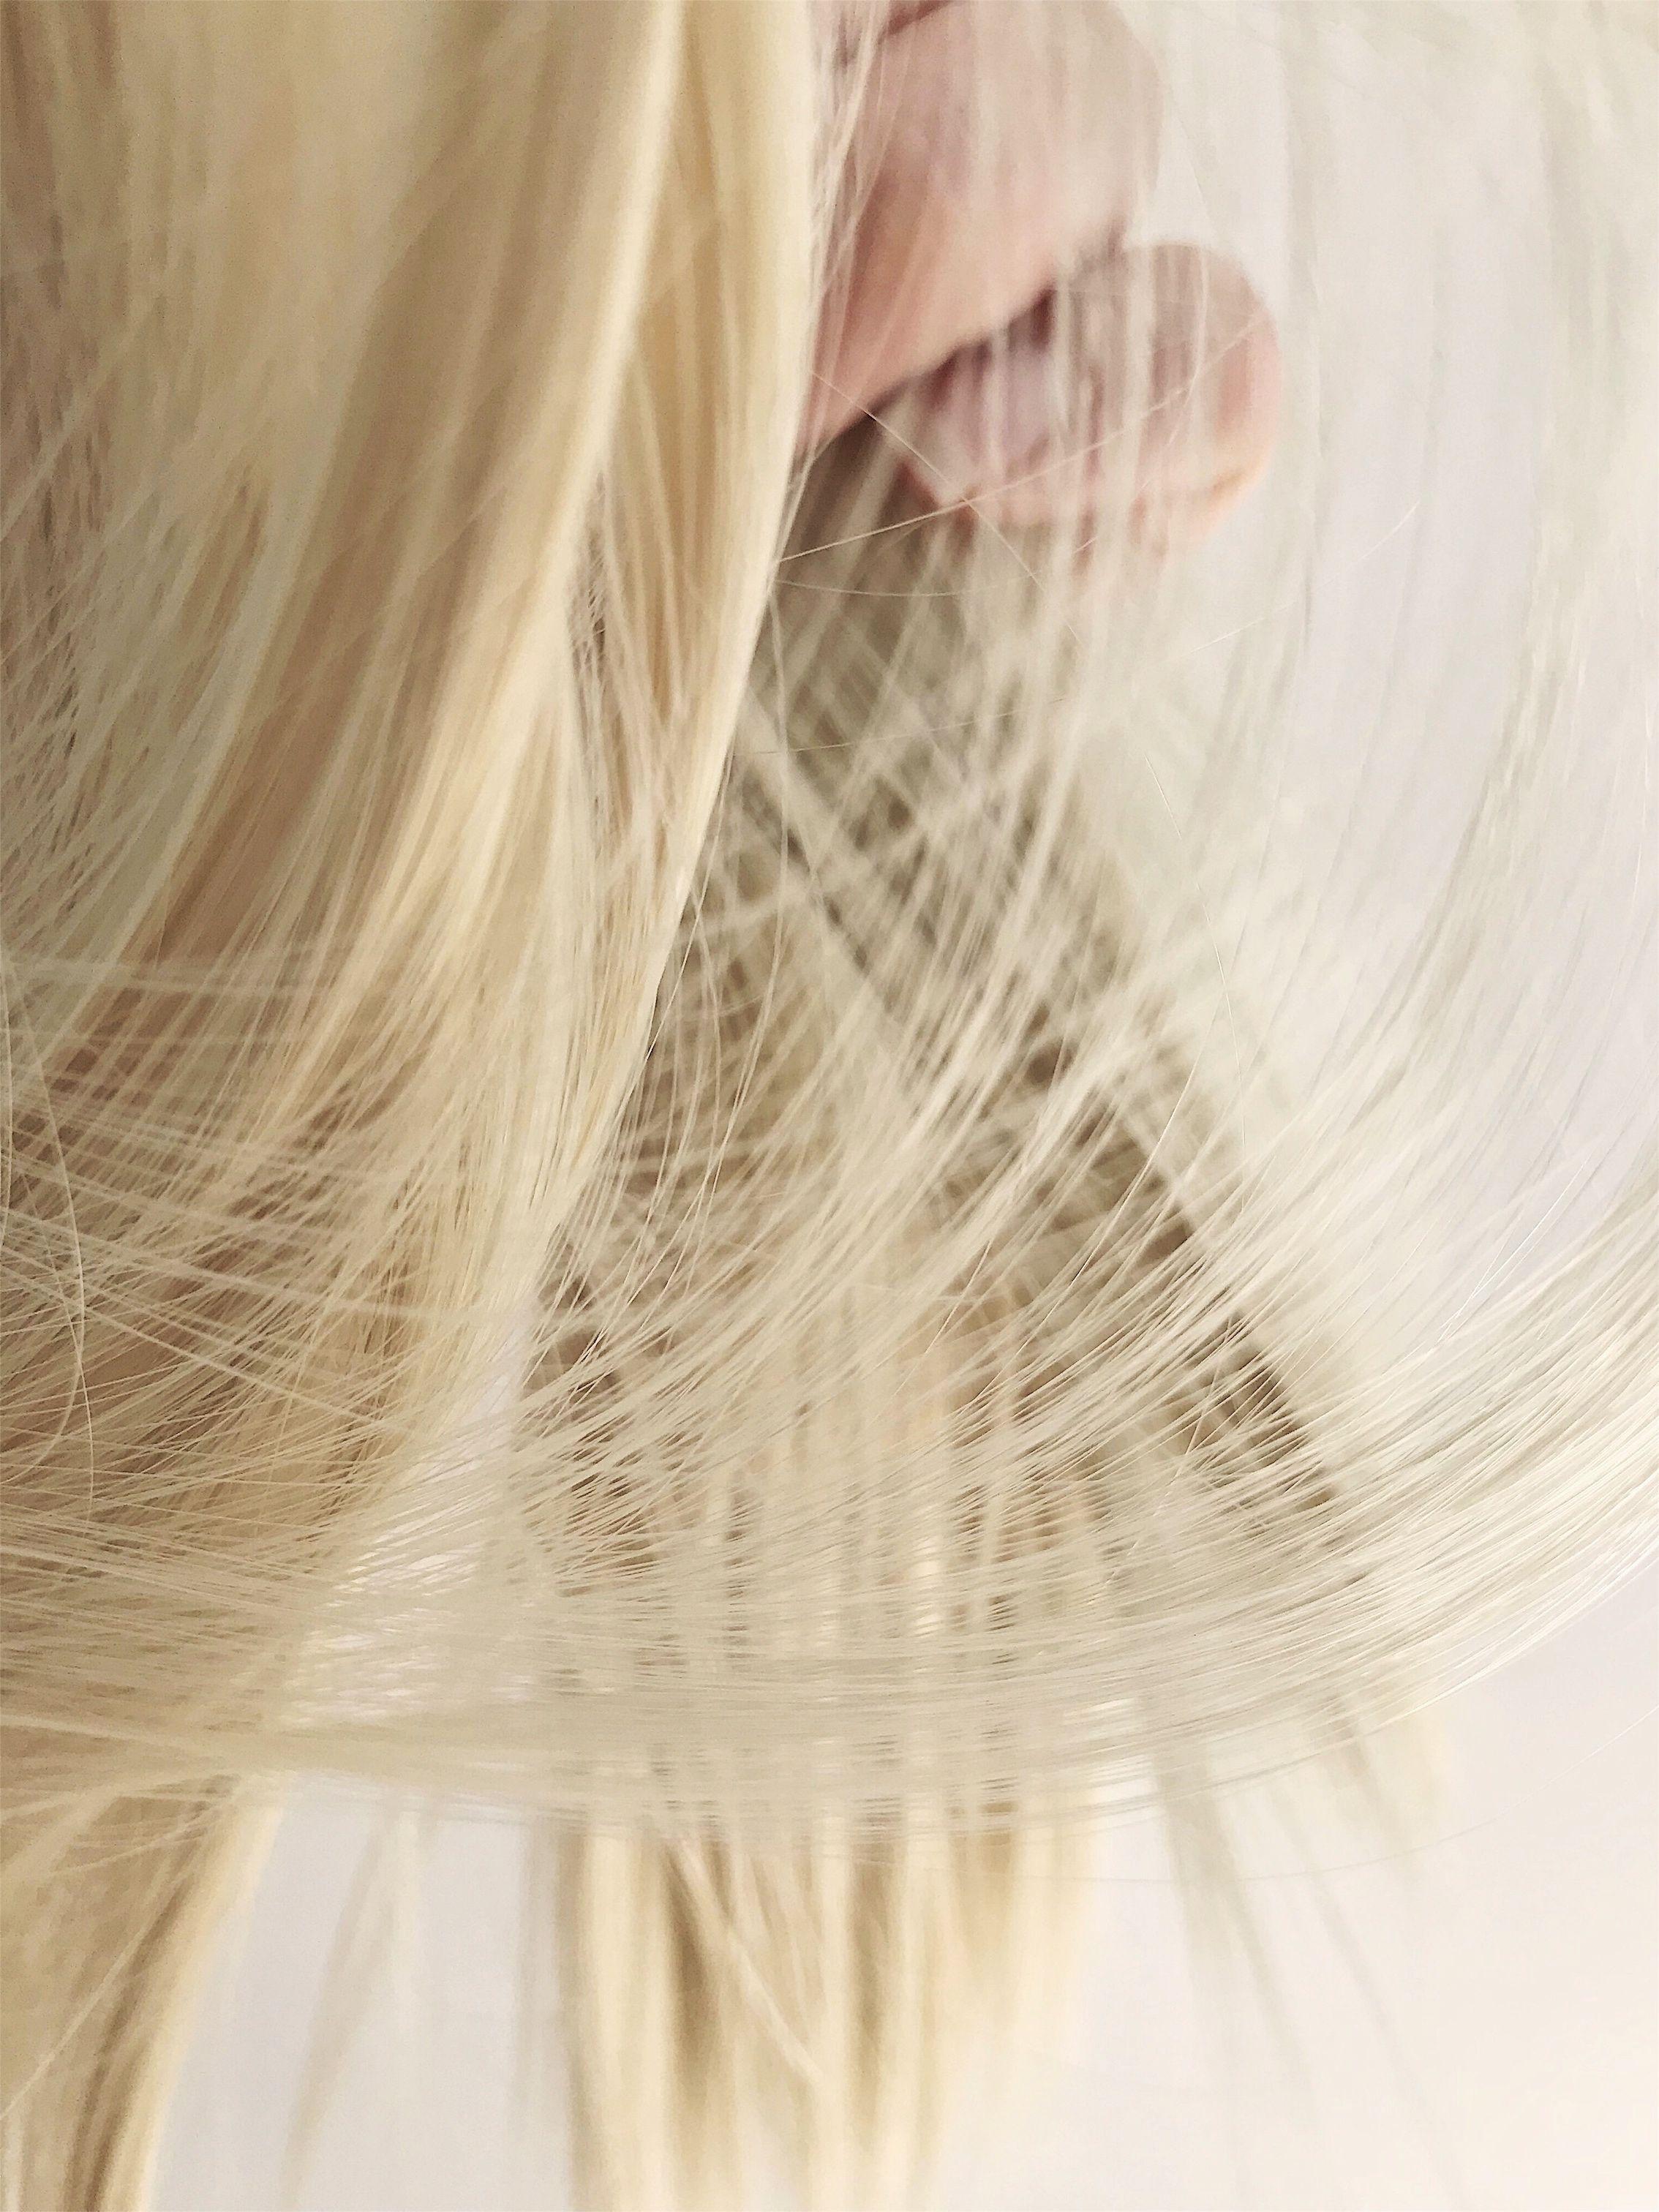 10 2 Very Light Beige Blonde In 2020 Beige Blonde Light Blonde